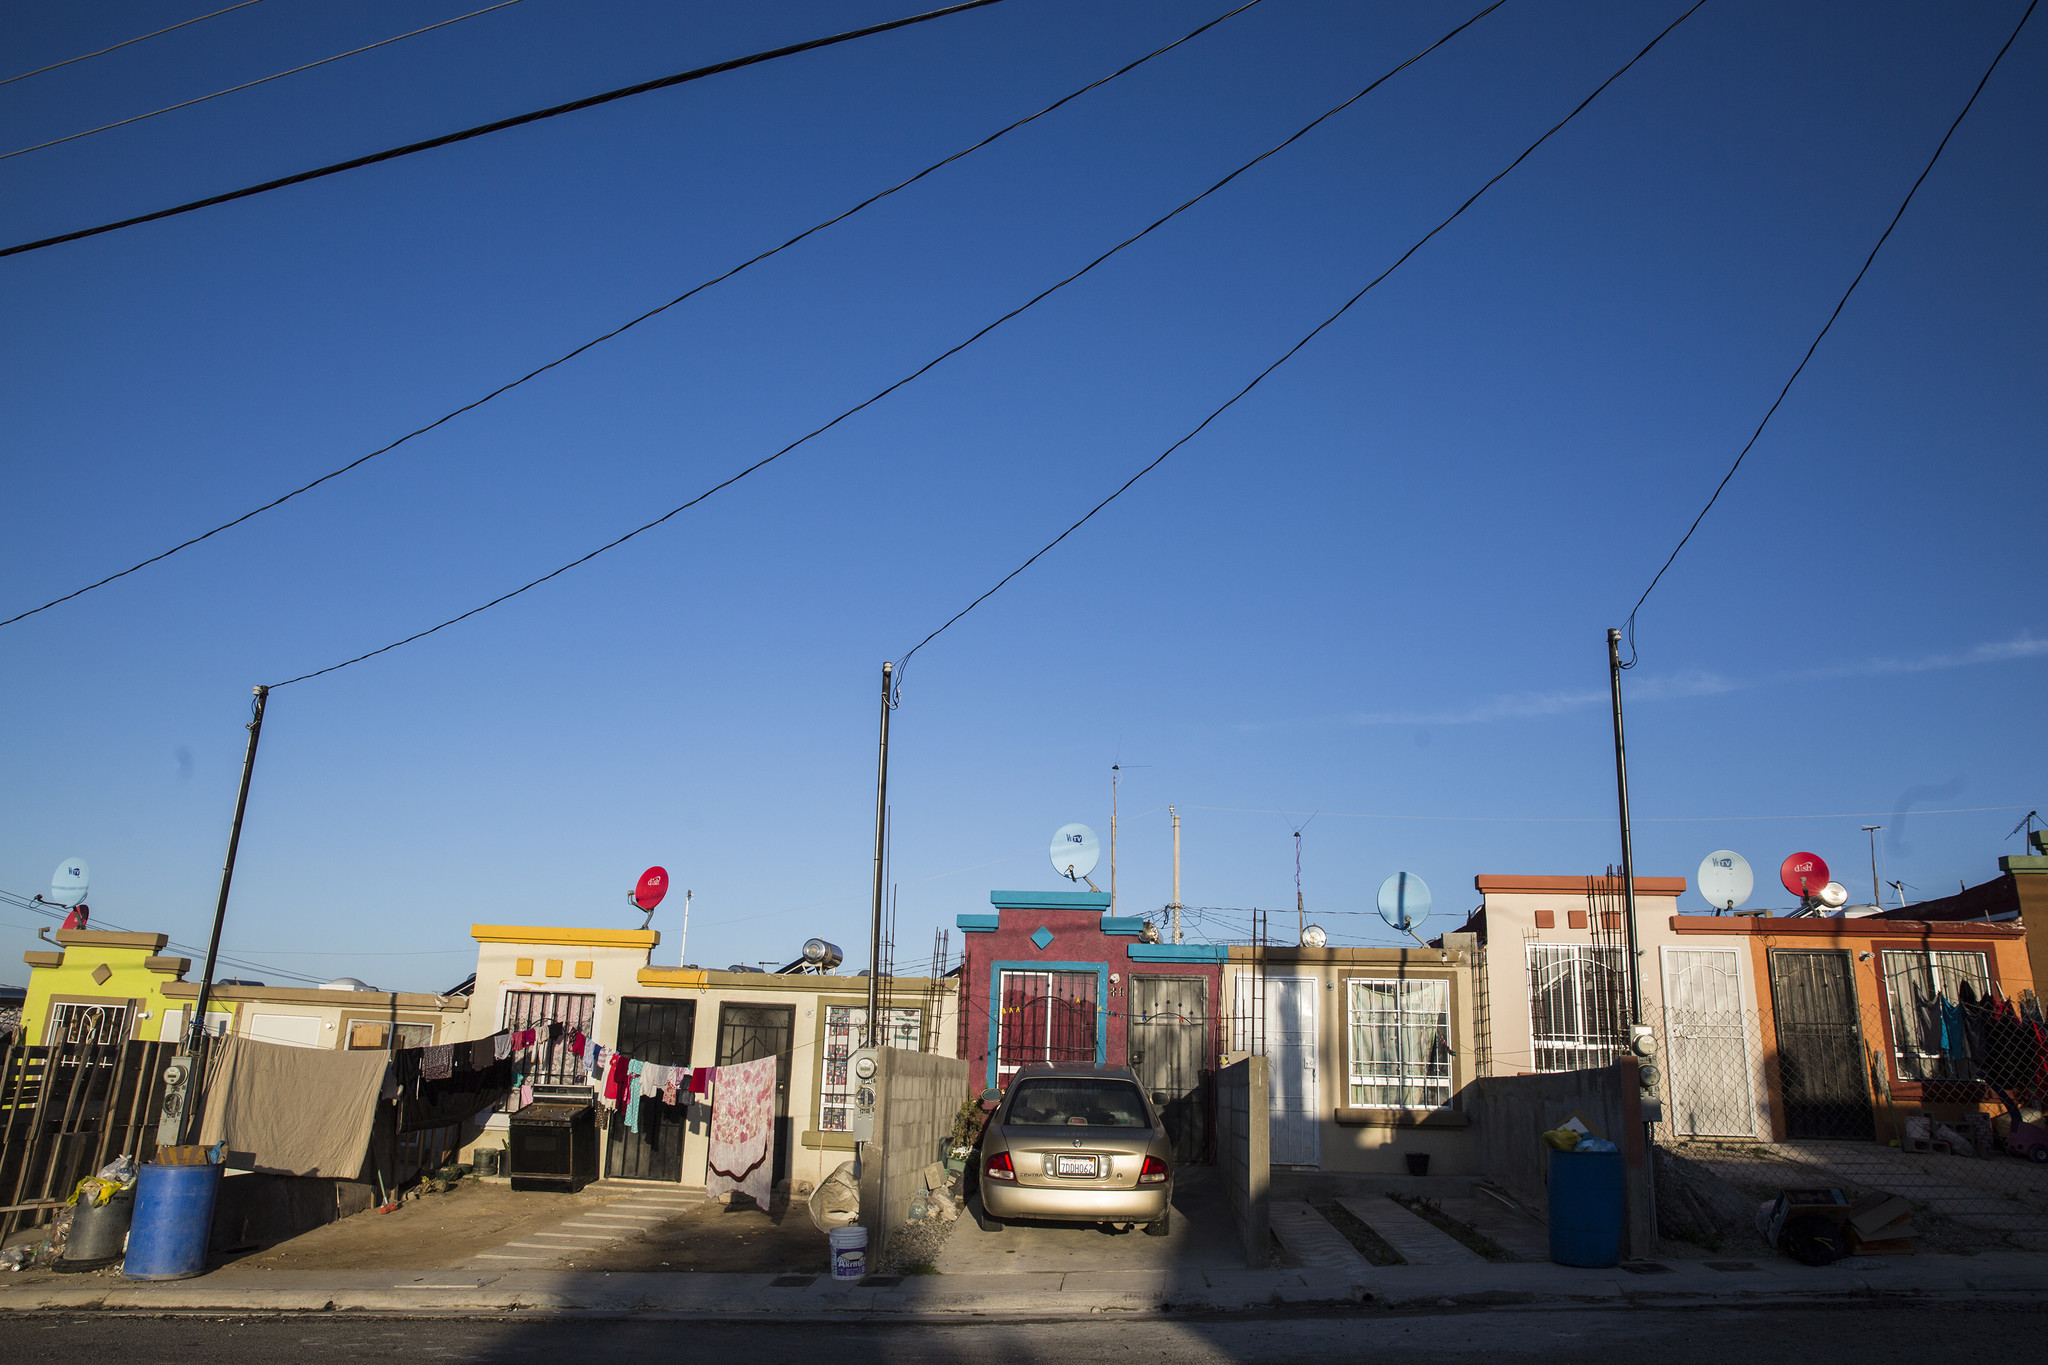 [Image: la-me-mexhousing-mini-casas-20171116-014]